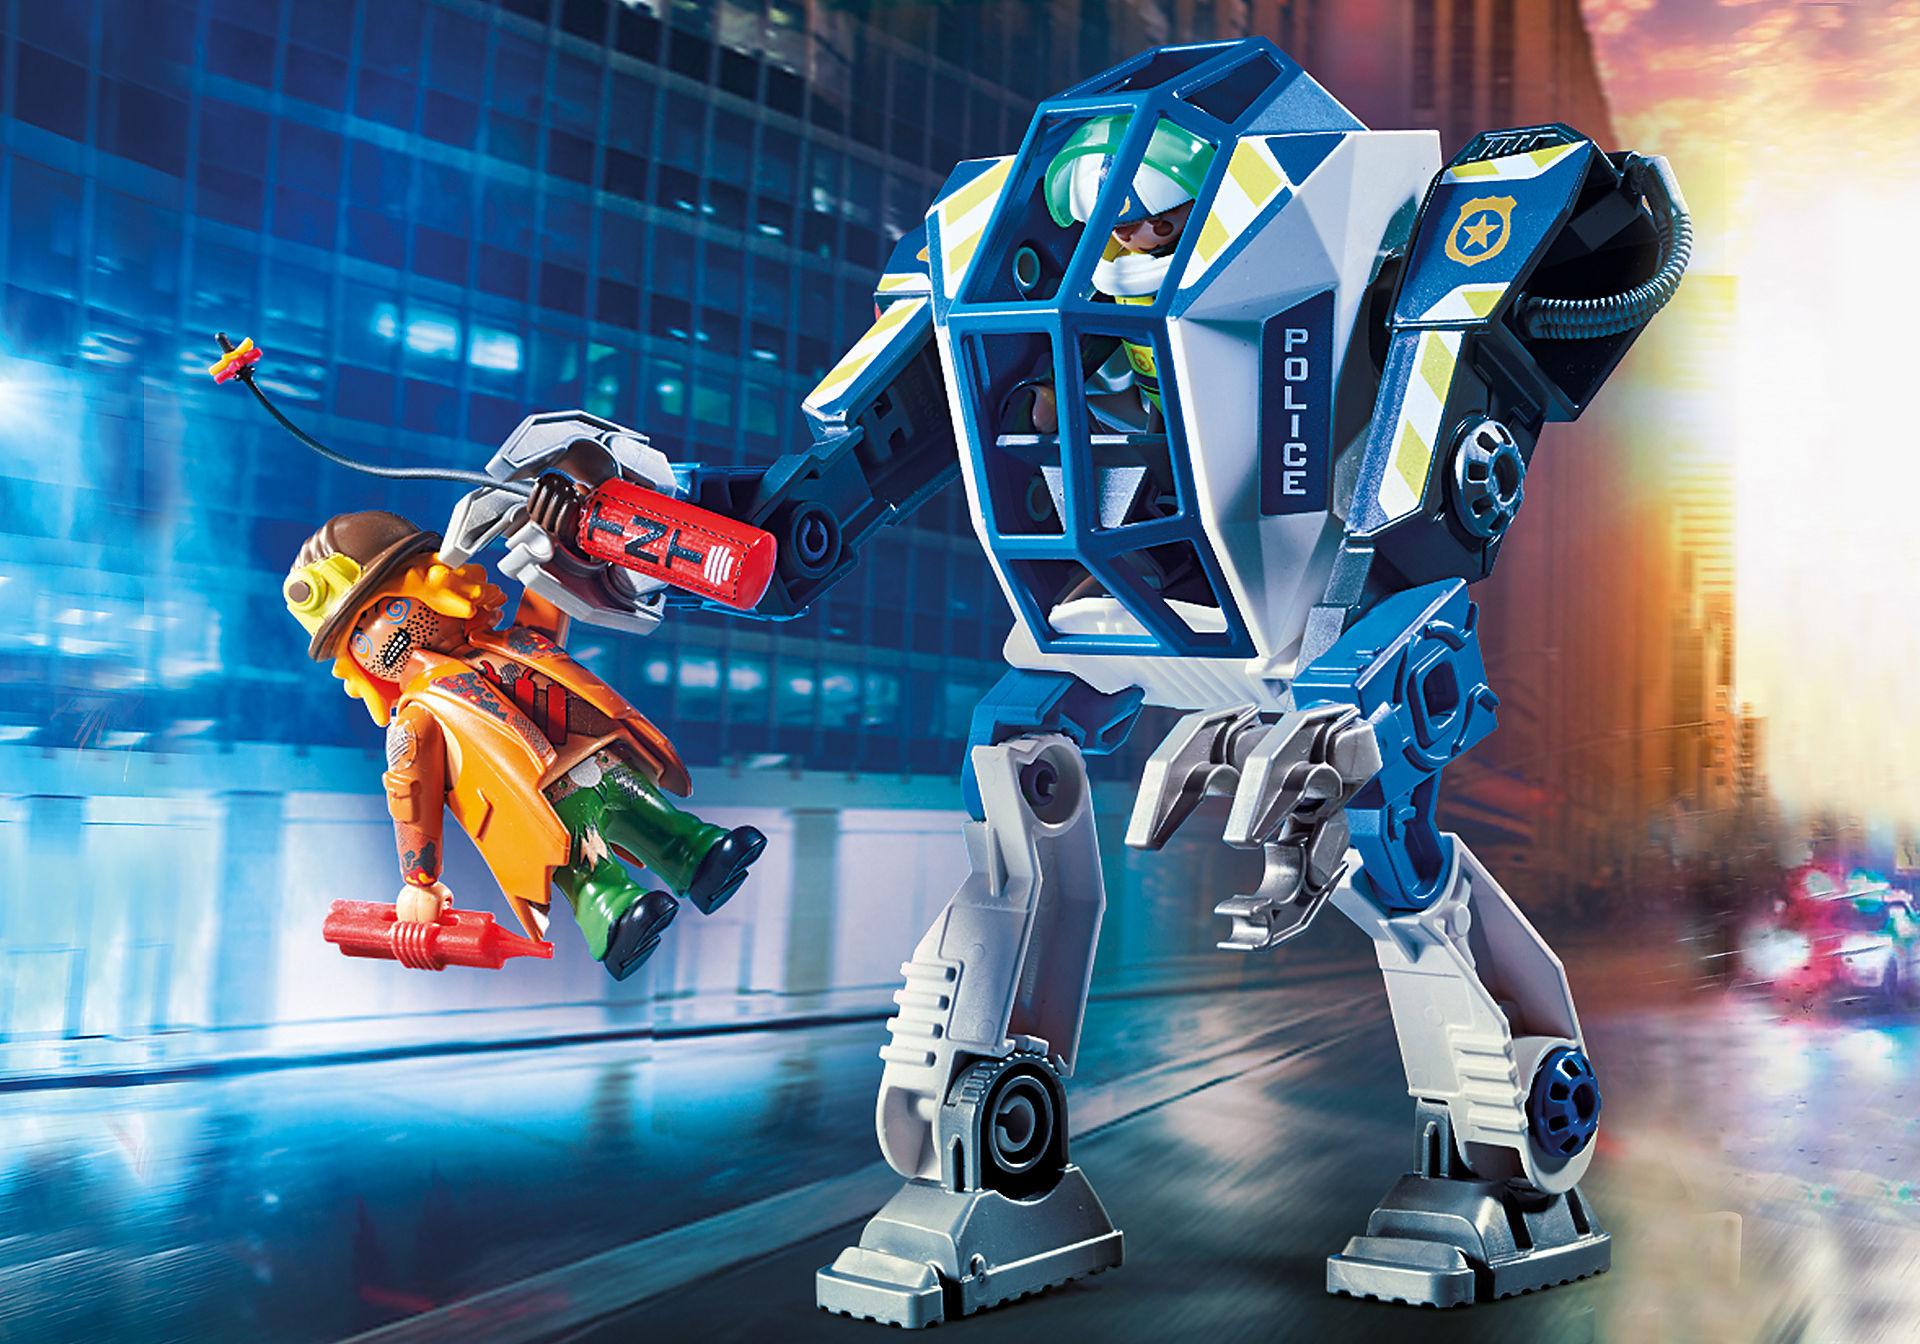 70571 Robot Policía: operación Especial zoom image4